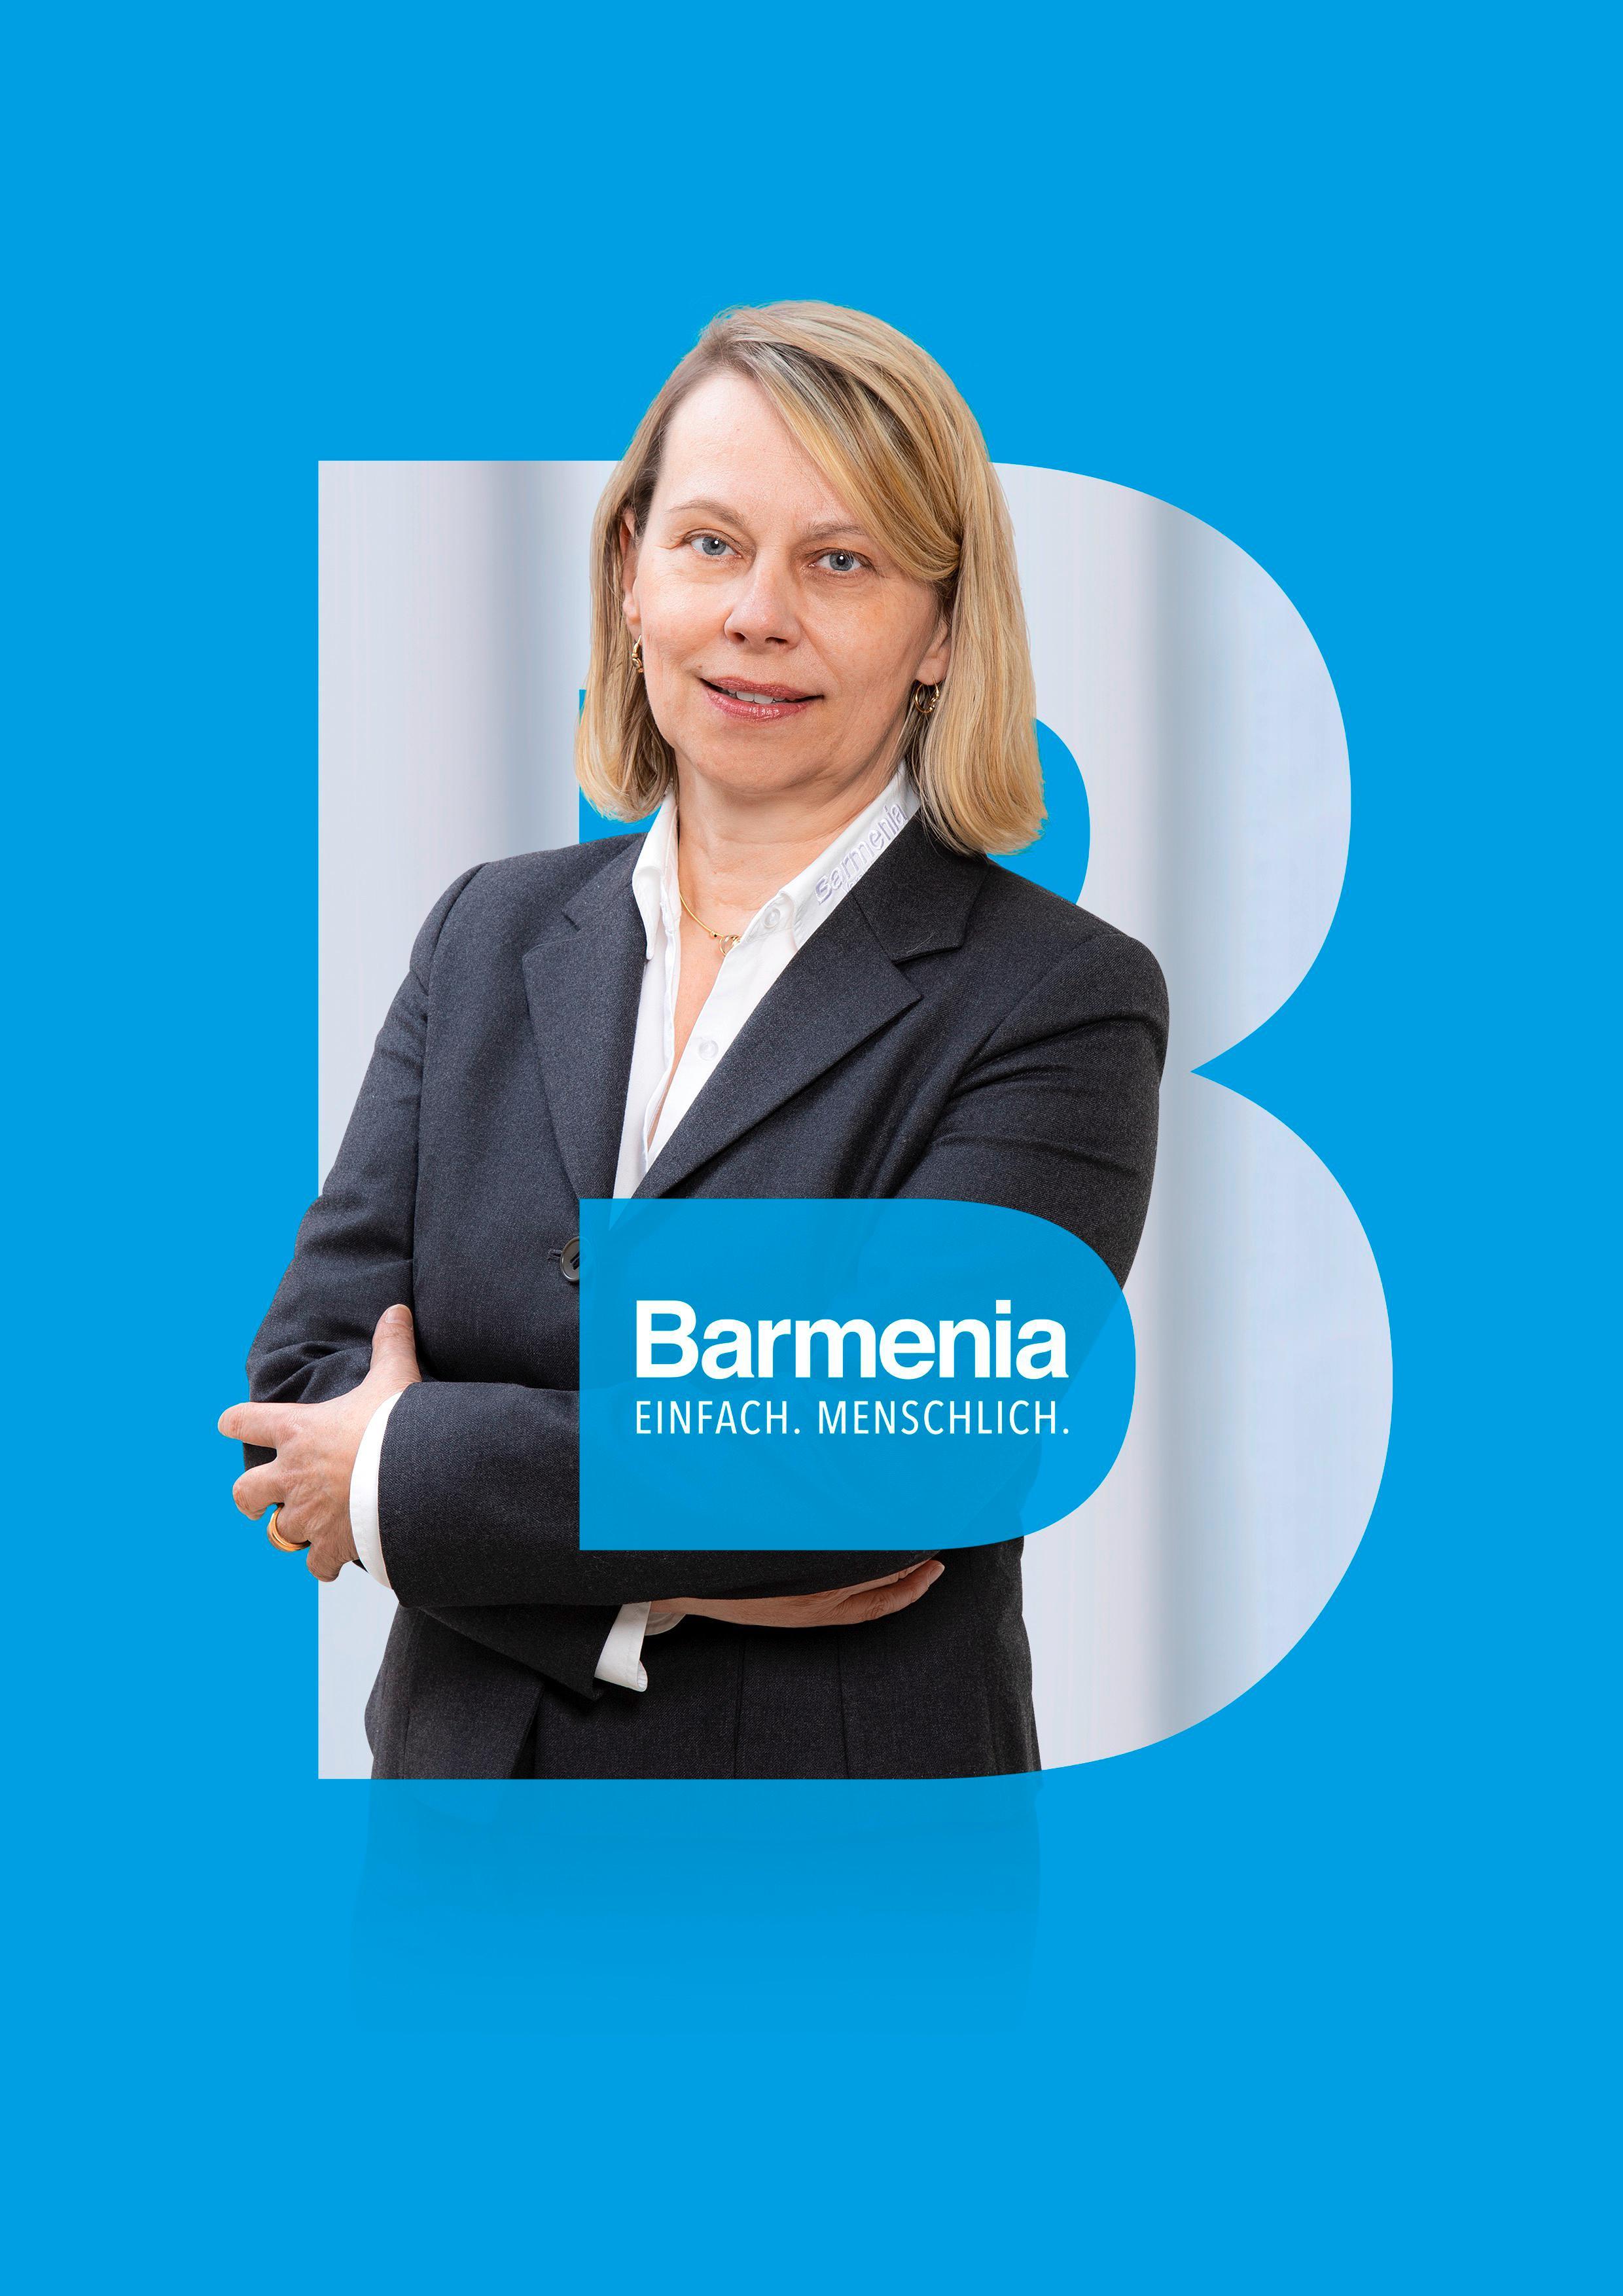 Barmenia Versicherung - Ursula Krawinkel